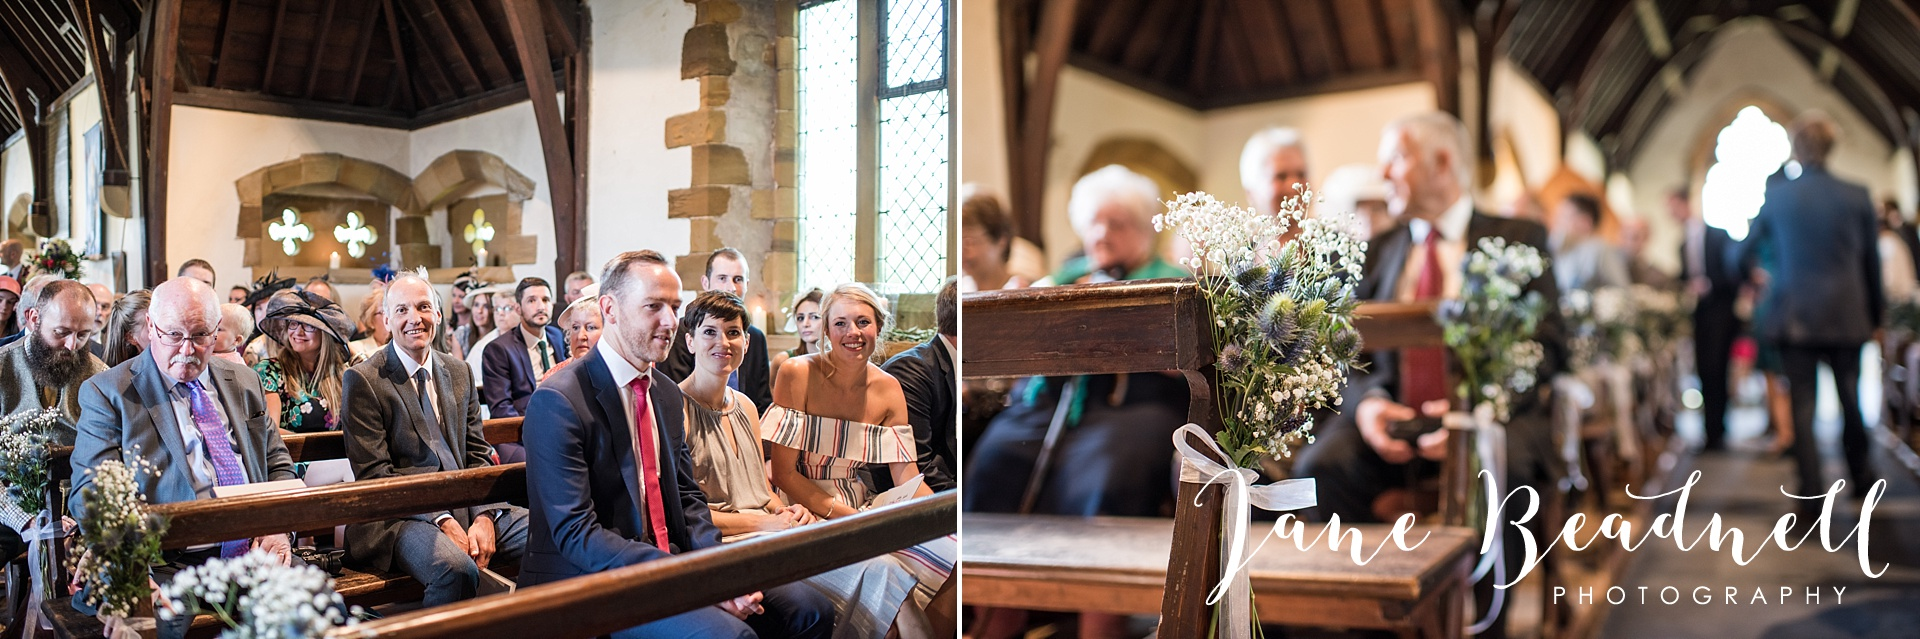 fine-art-wedding-photographer-jane-beadnell-yorkshire-wedding-photographer_0037